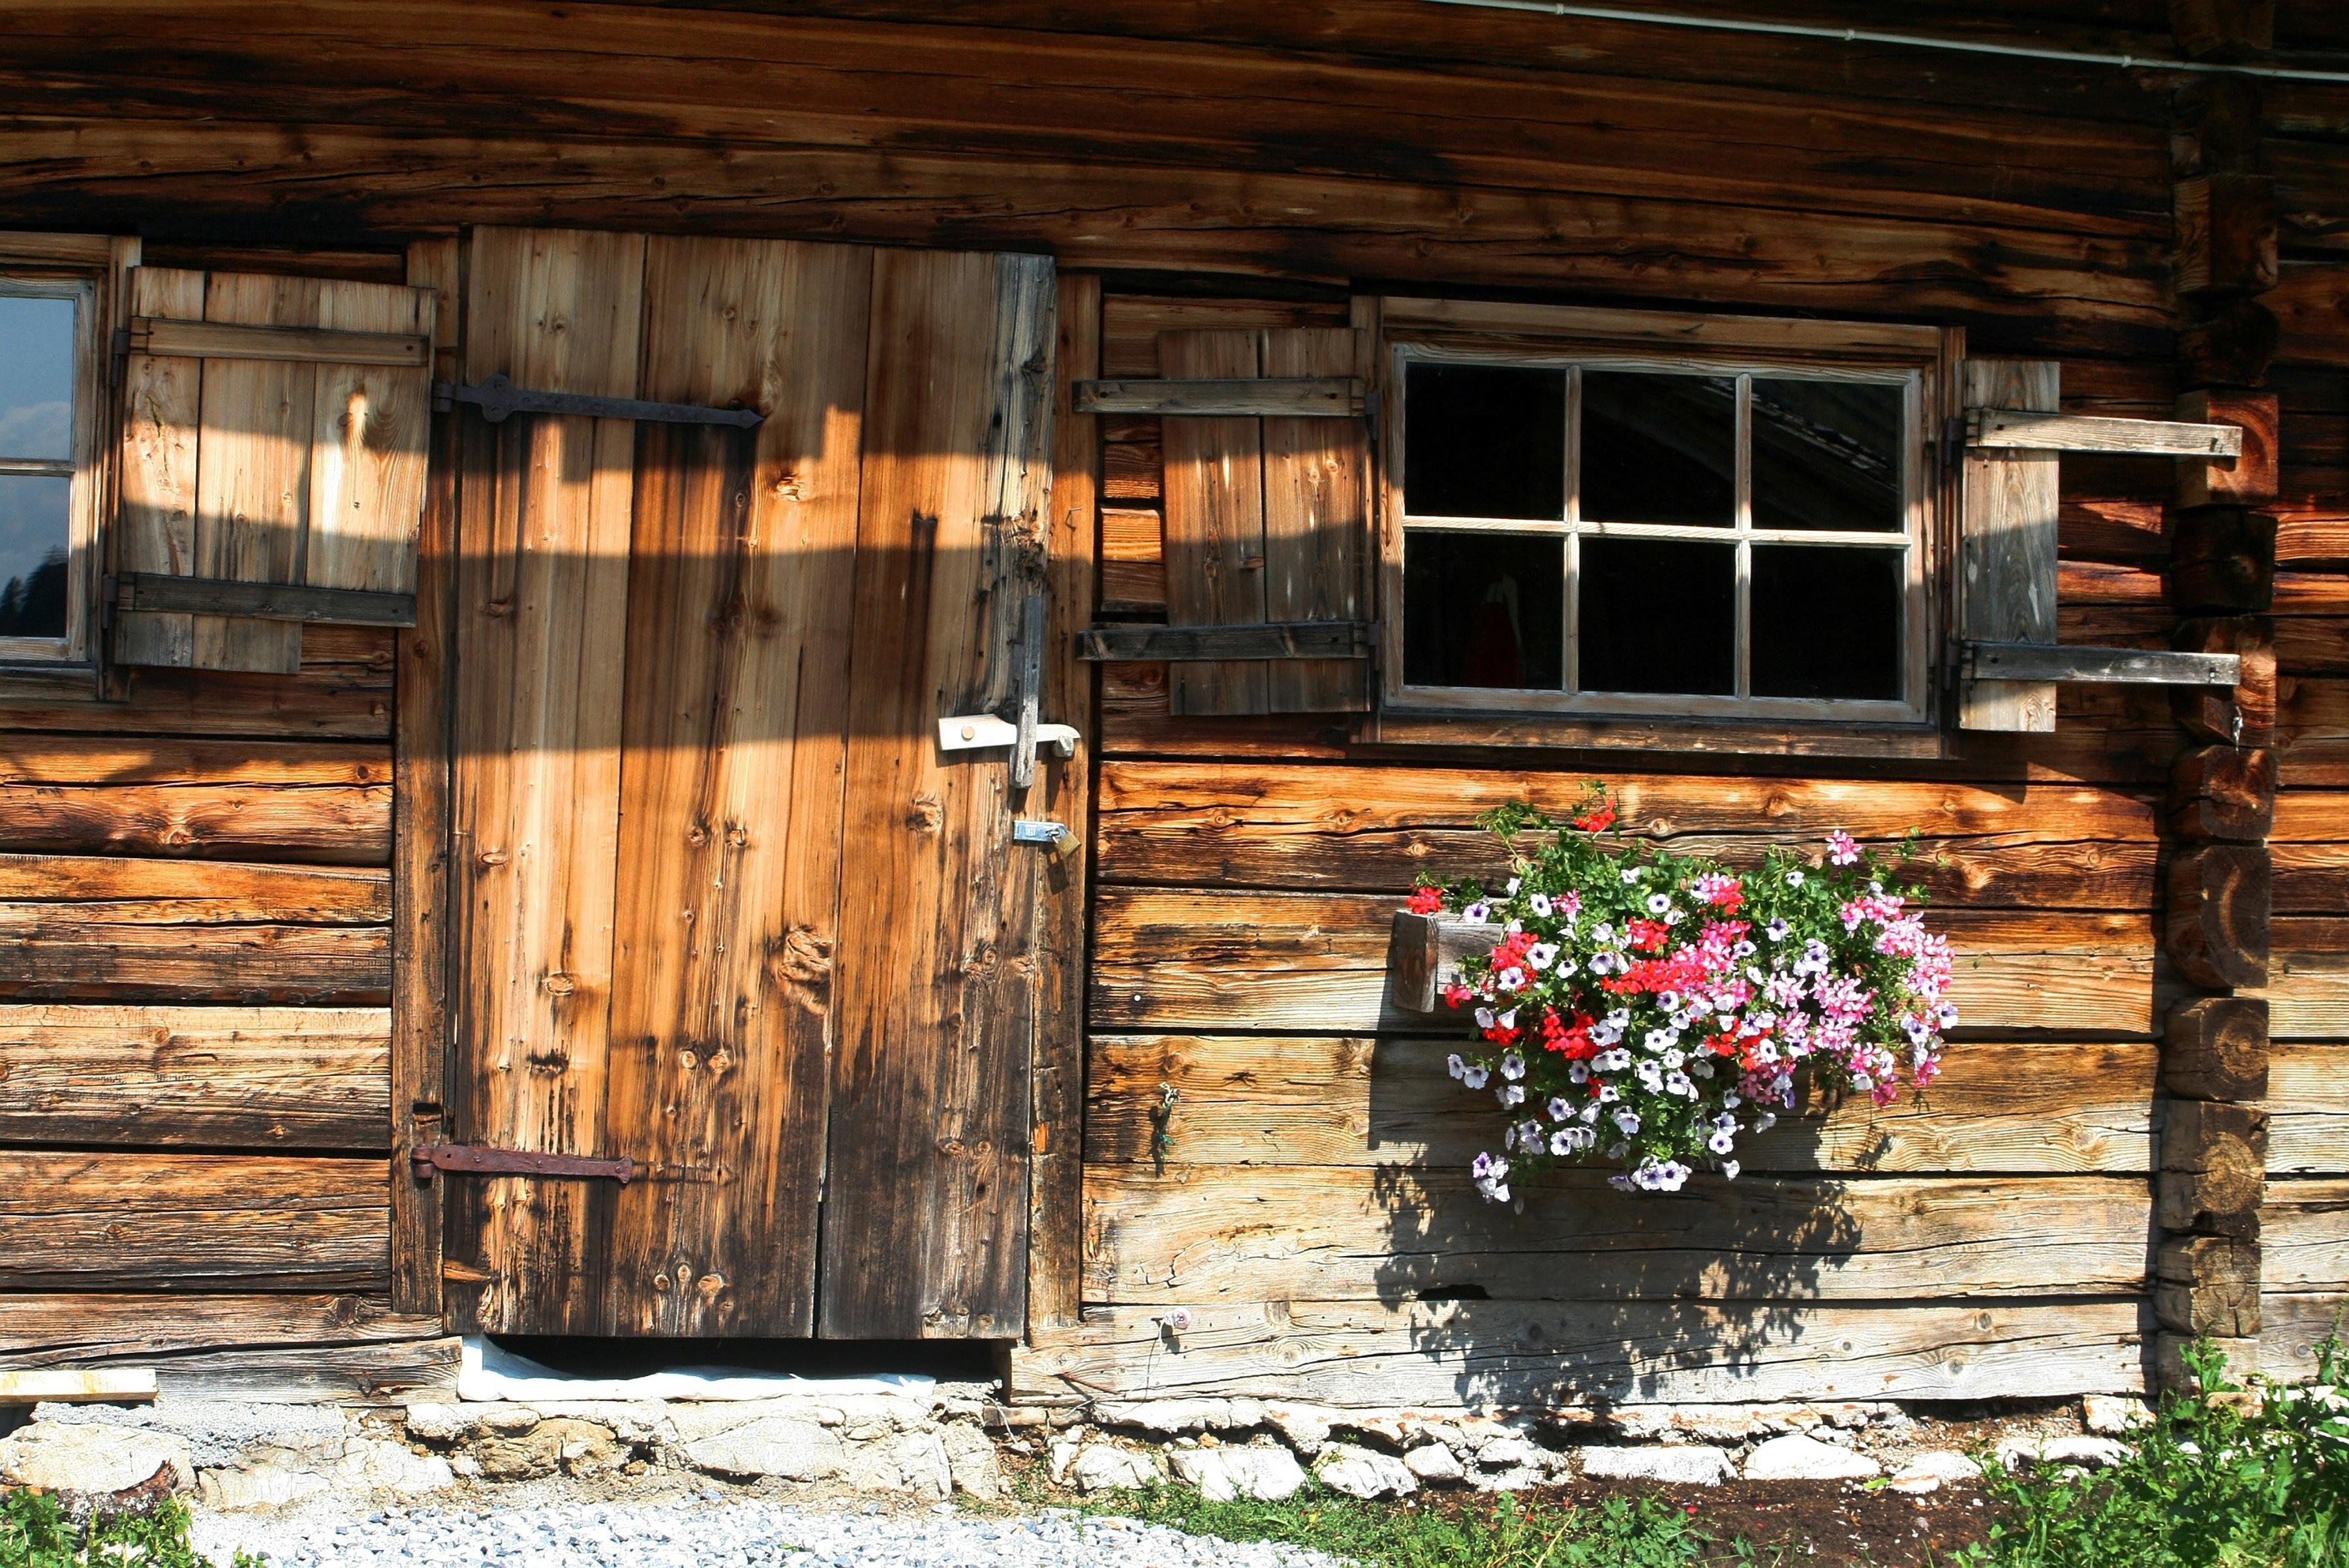 Facade of Kiva's wood cabin in New Mexico